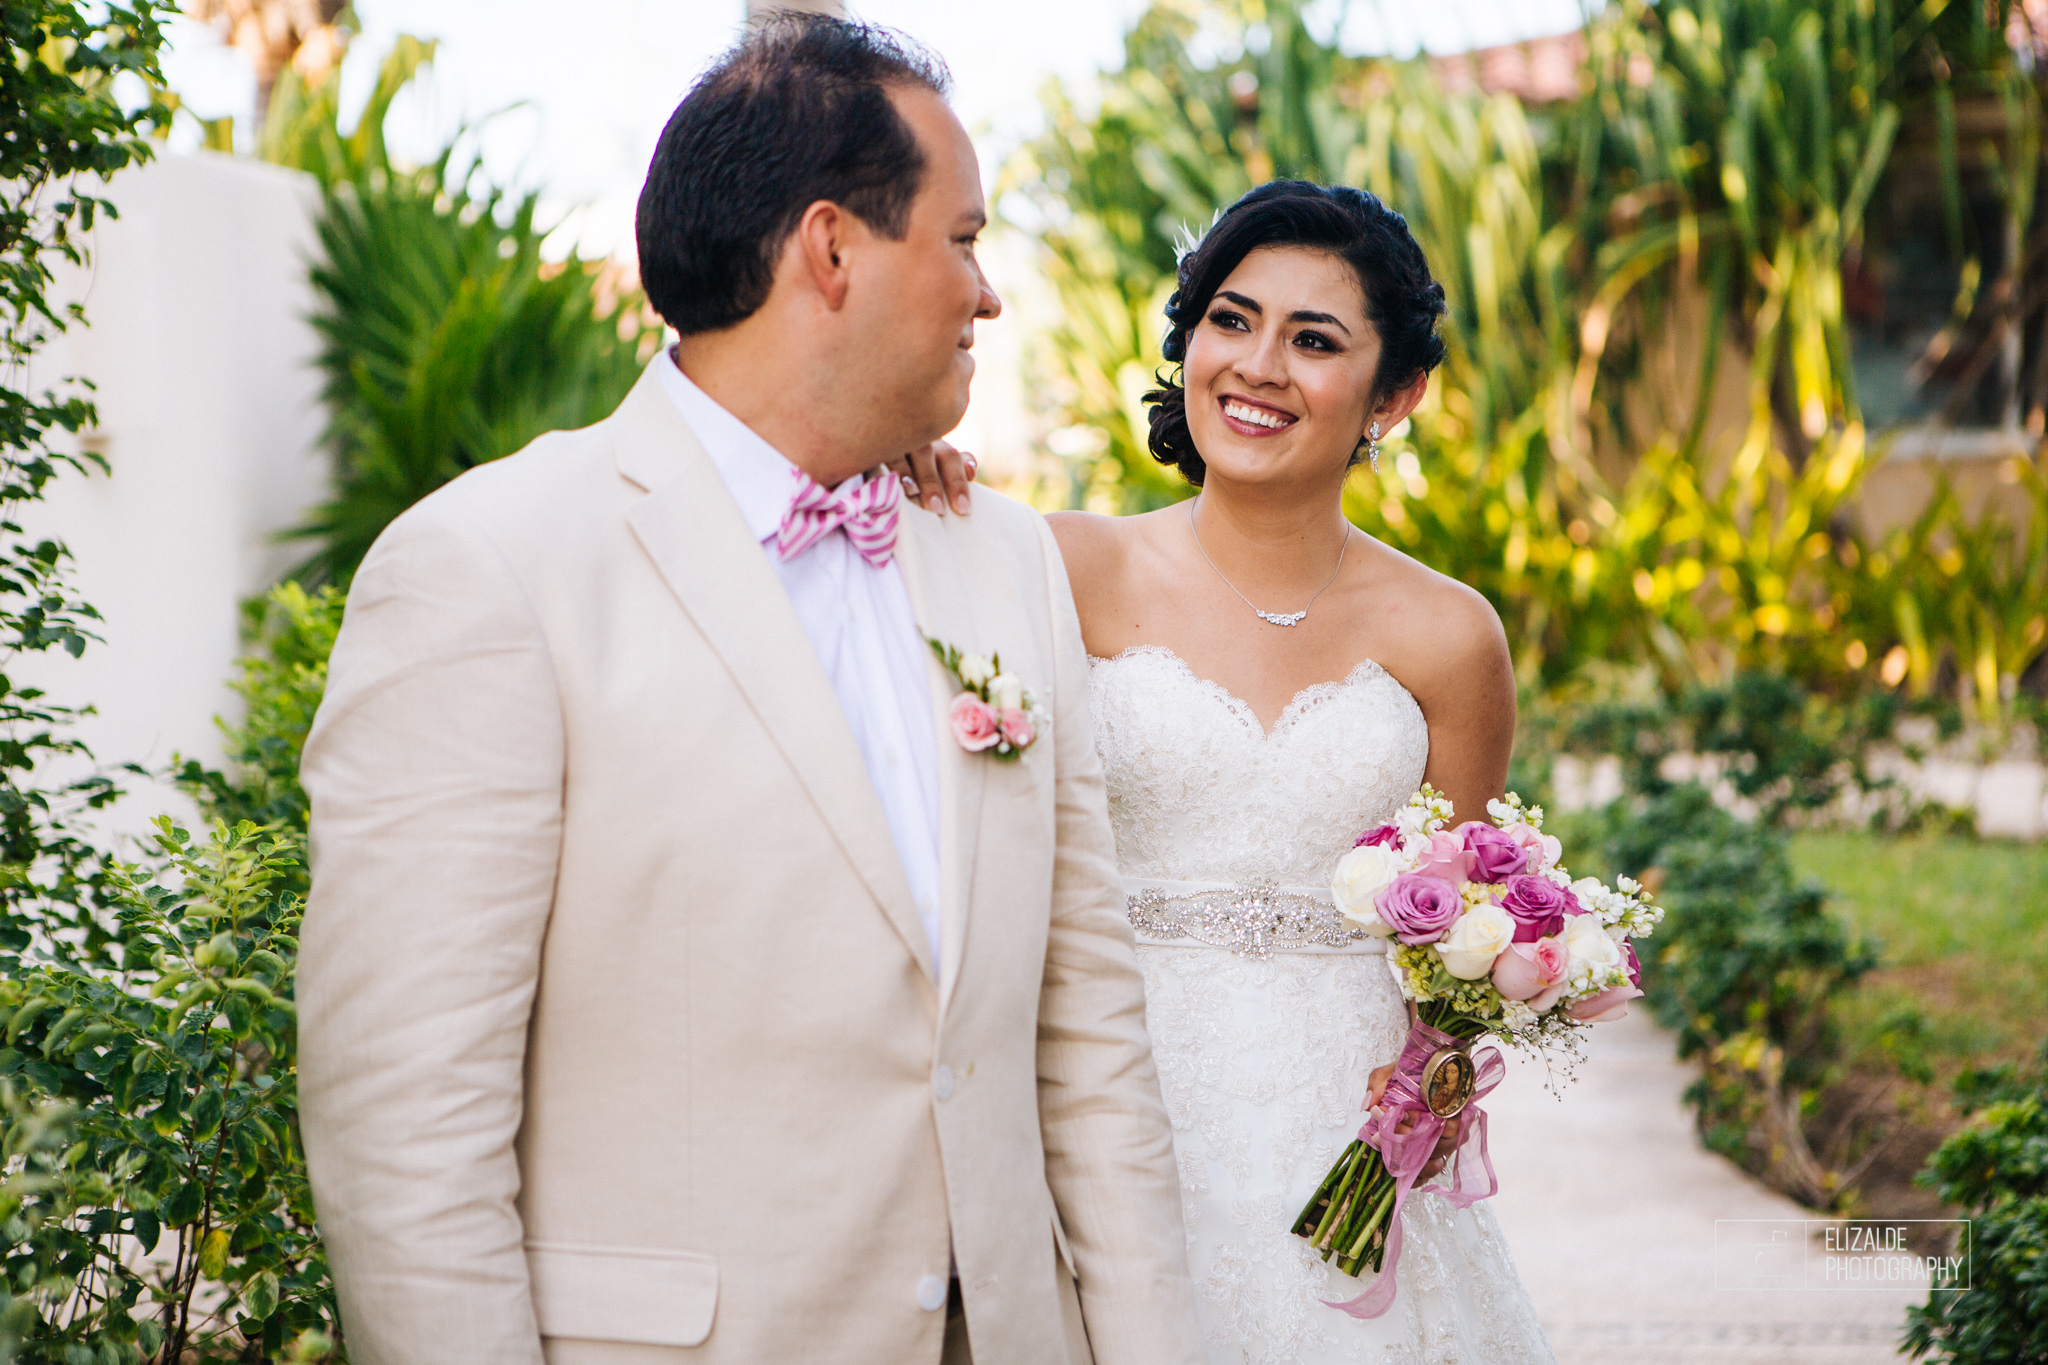 Pay and Ferran_Acapulco_Destination Wedding_Elizalde Photography-58.jpg